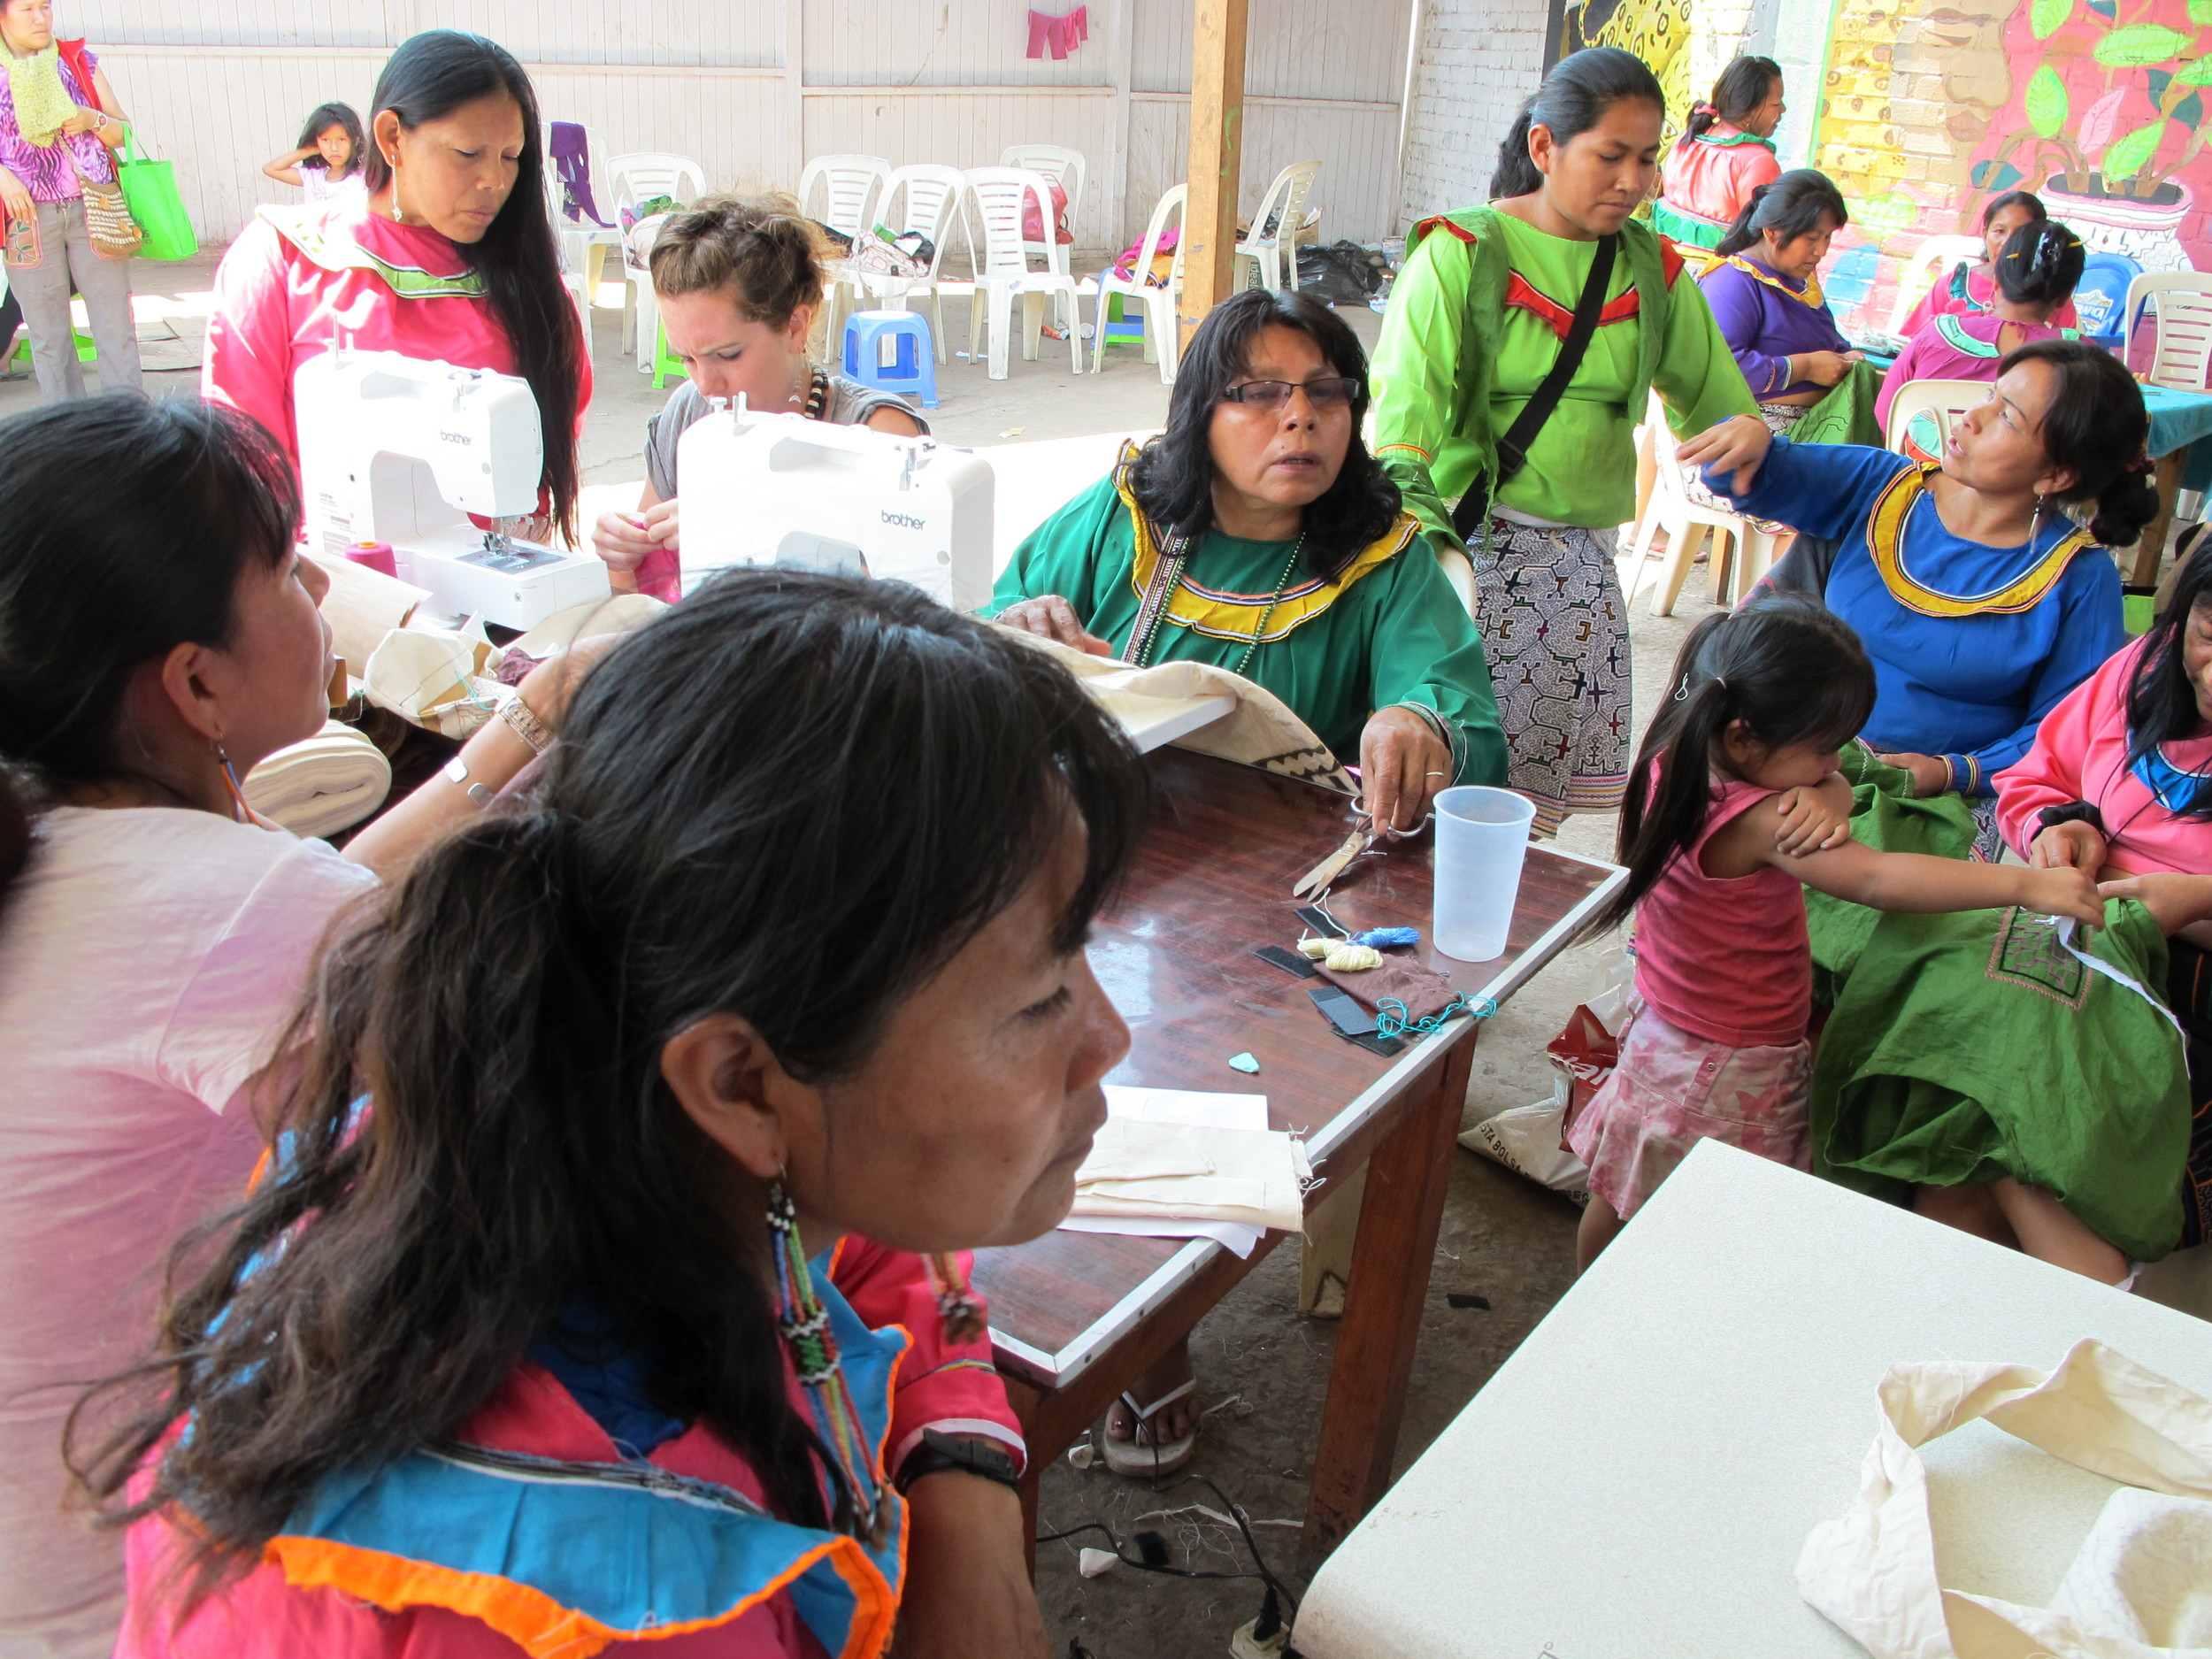 Sewing and Kené workshop with Las Madres Ashë, Shipibo-Conibo community of Cantagallo, Lima, Peru.